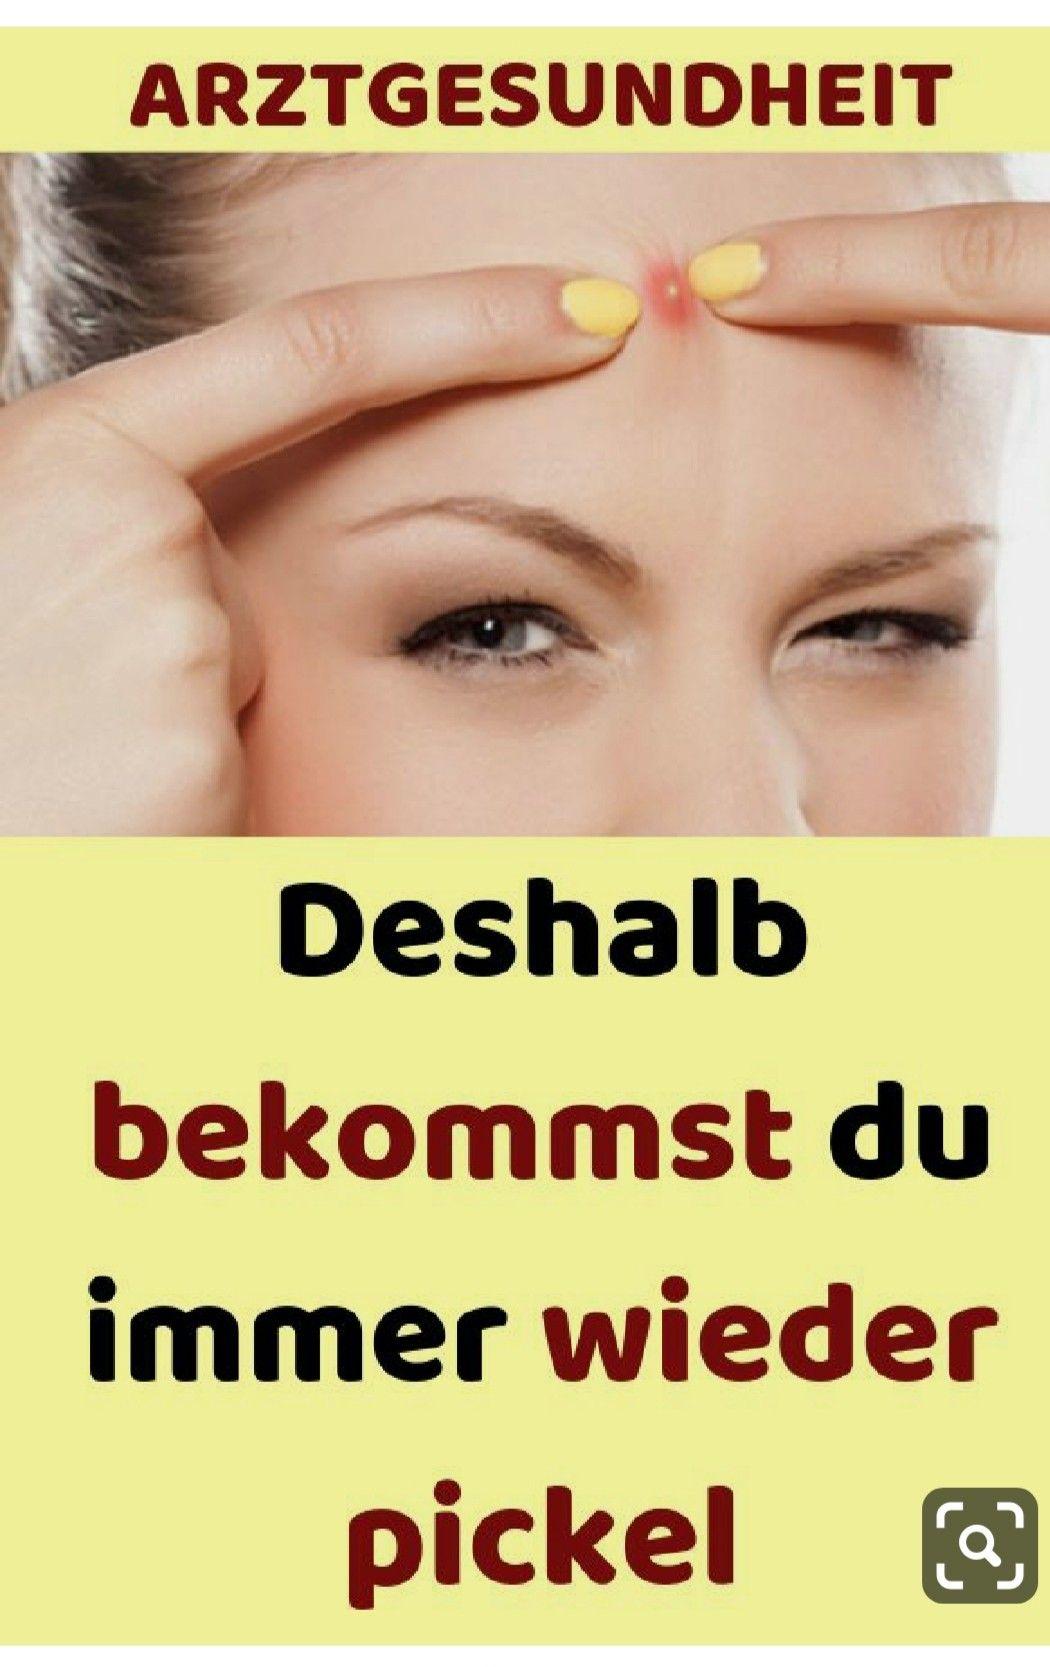 deshalb bekommst du immer wieder pickel#aloevera#fitness#körperpflege#beauty#health